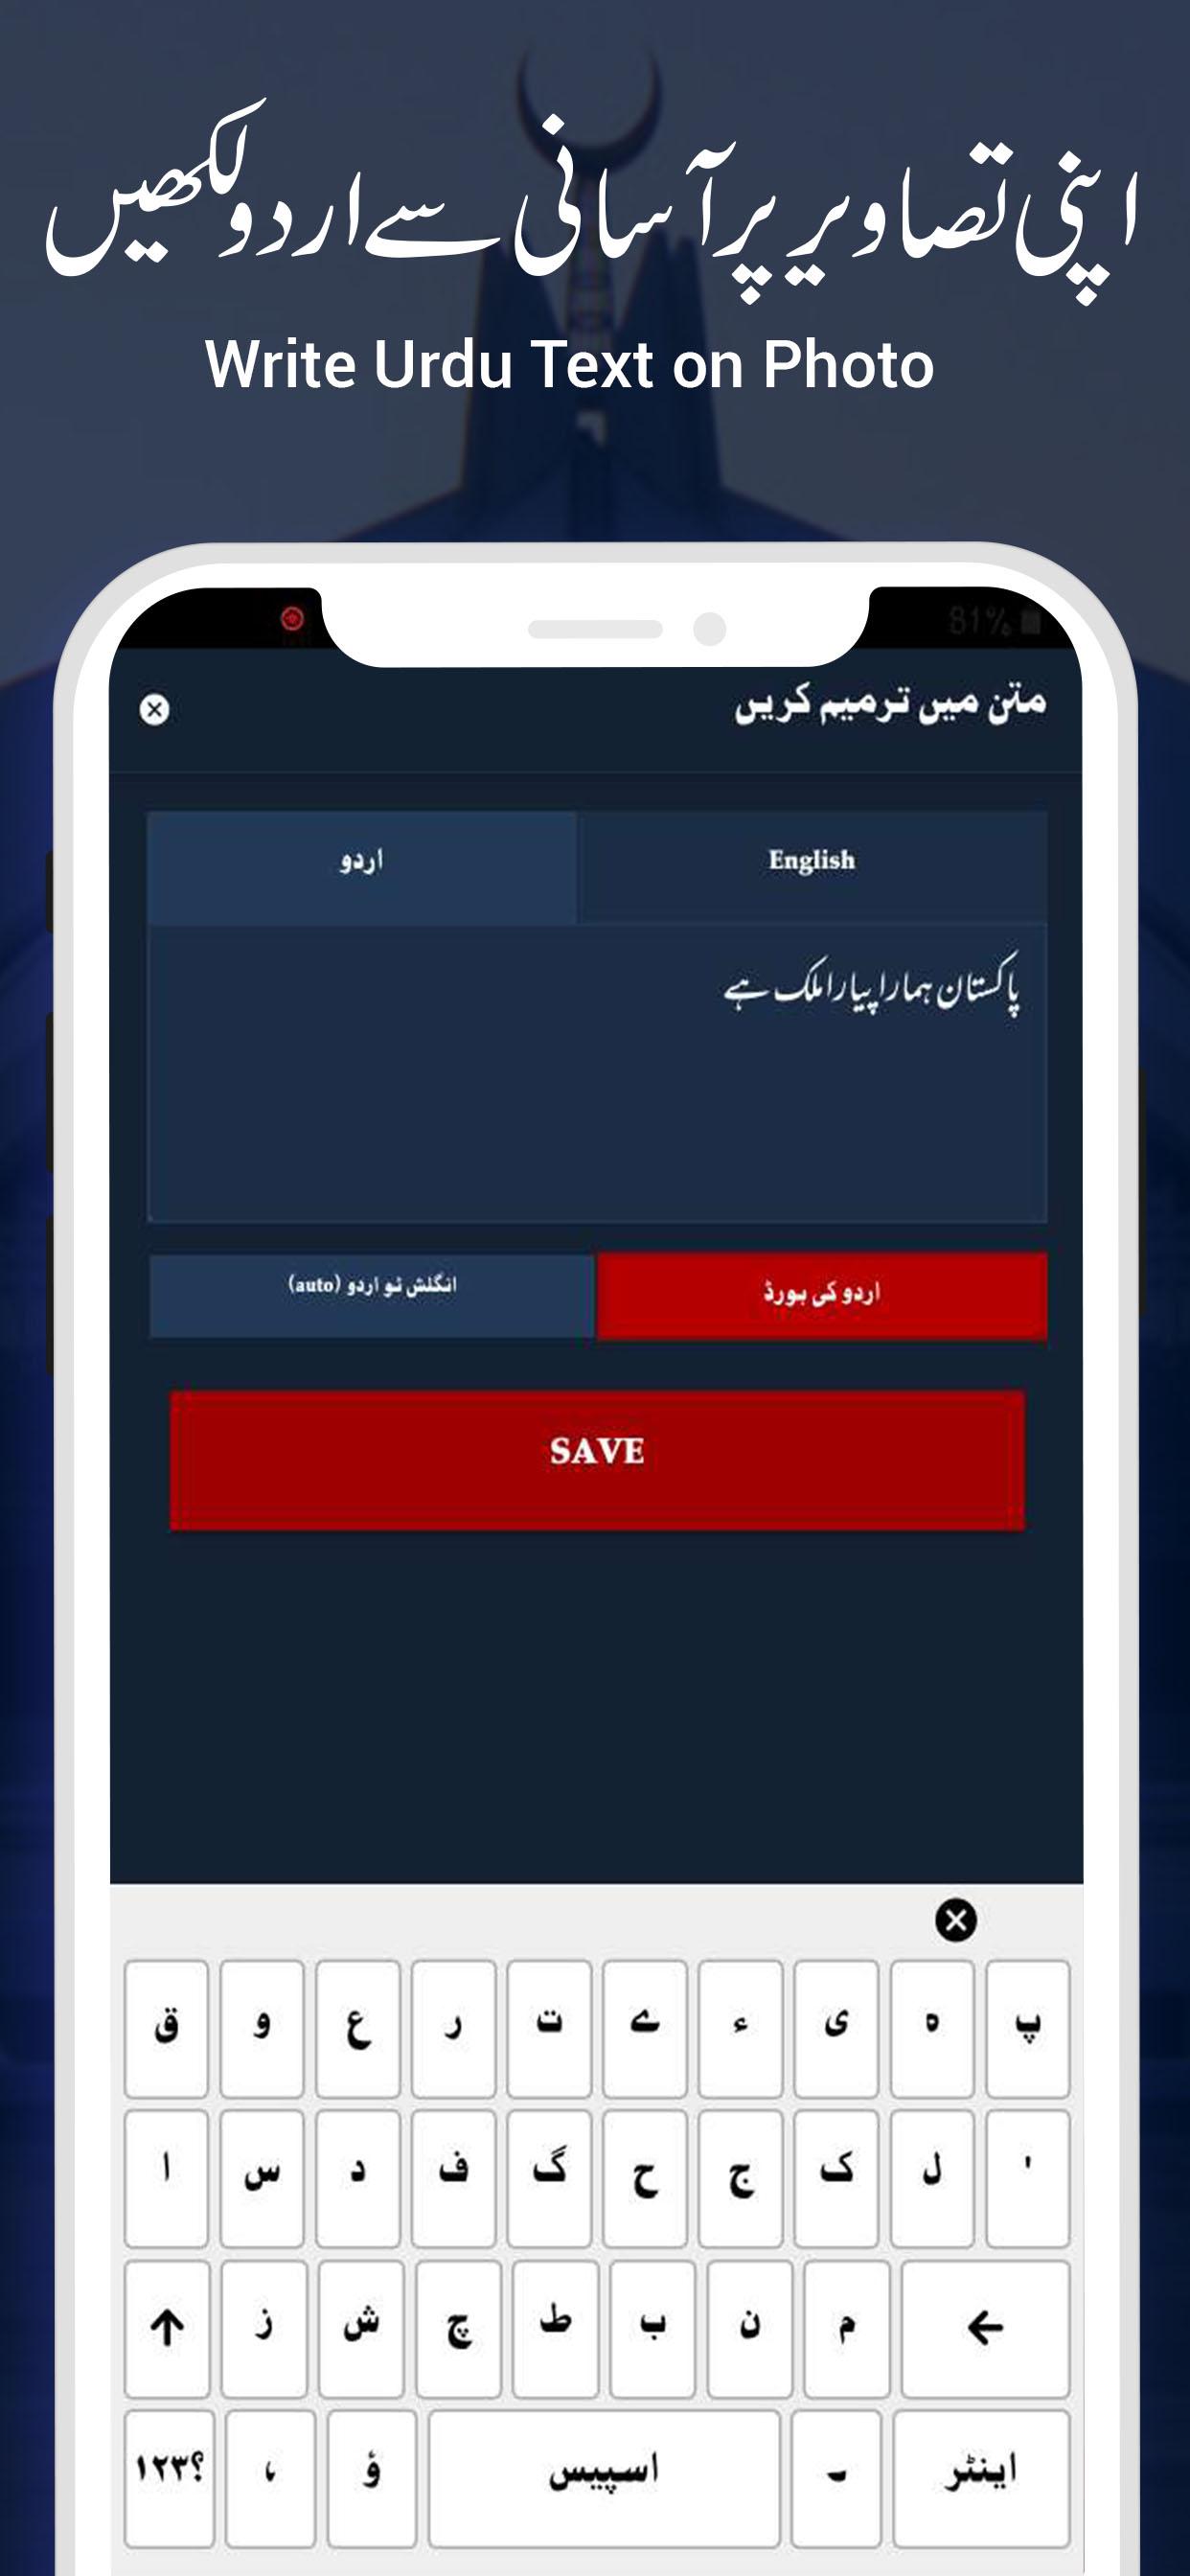 Urdu on Photo - Urdu Designer